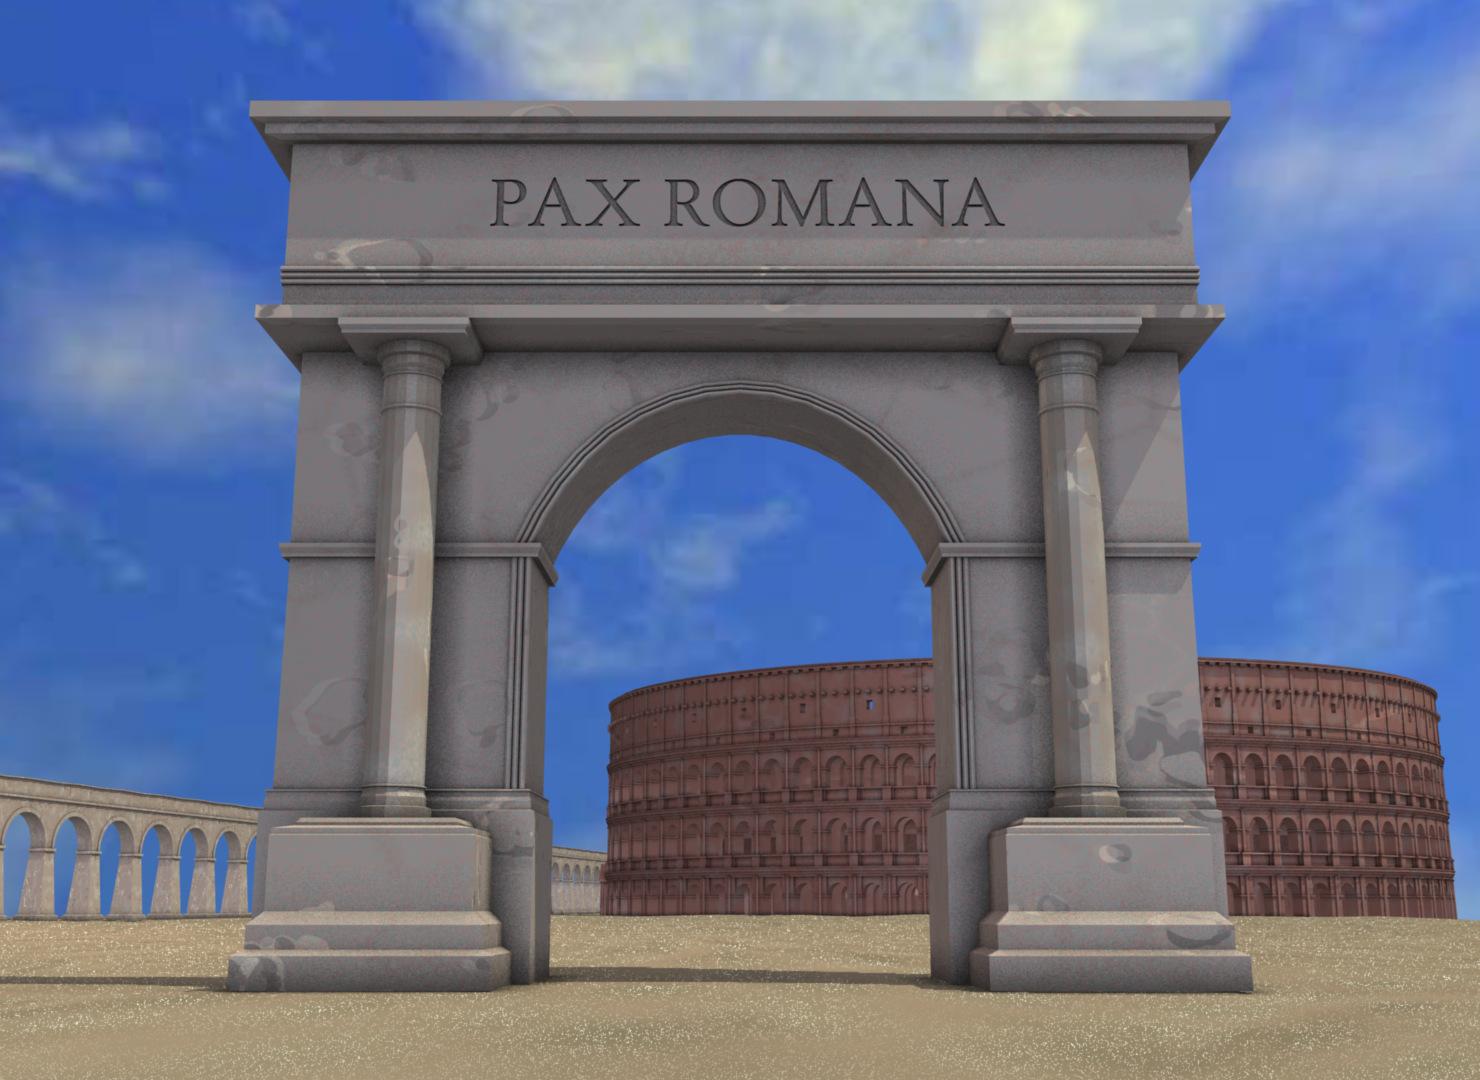 Roman Architecture By Kxlexk Image Mod Db